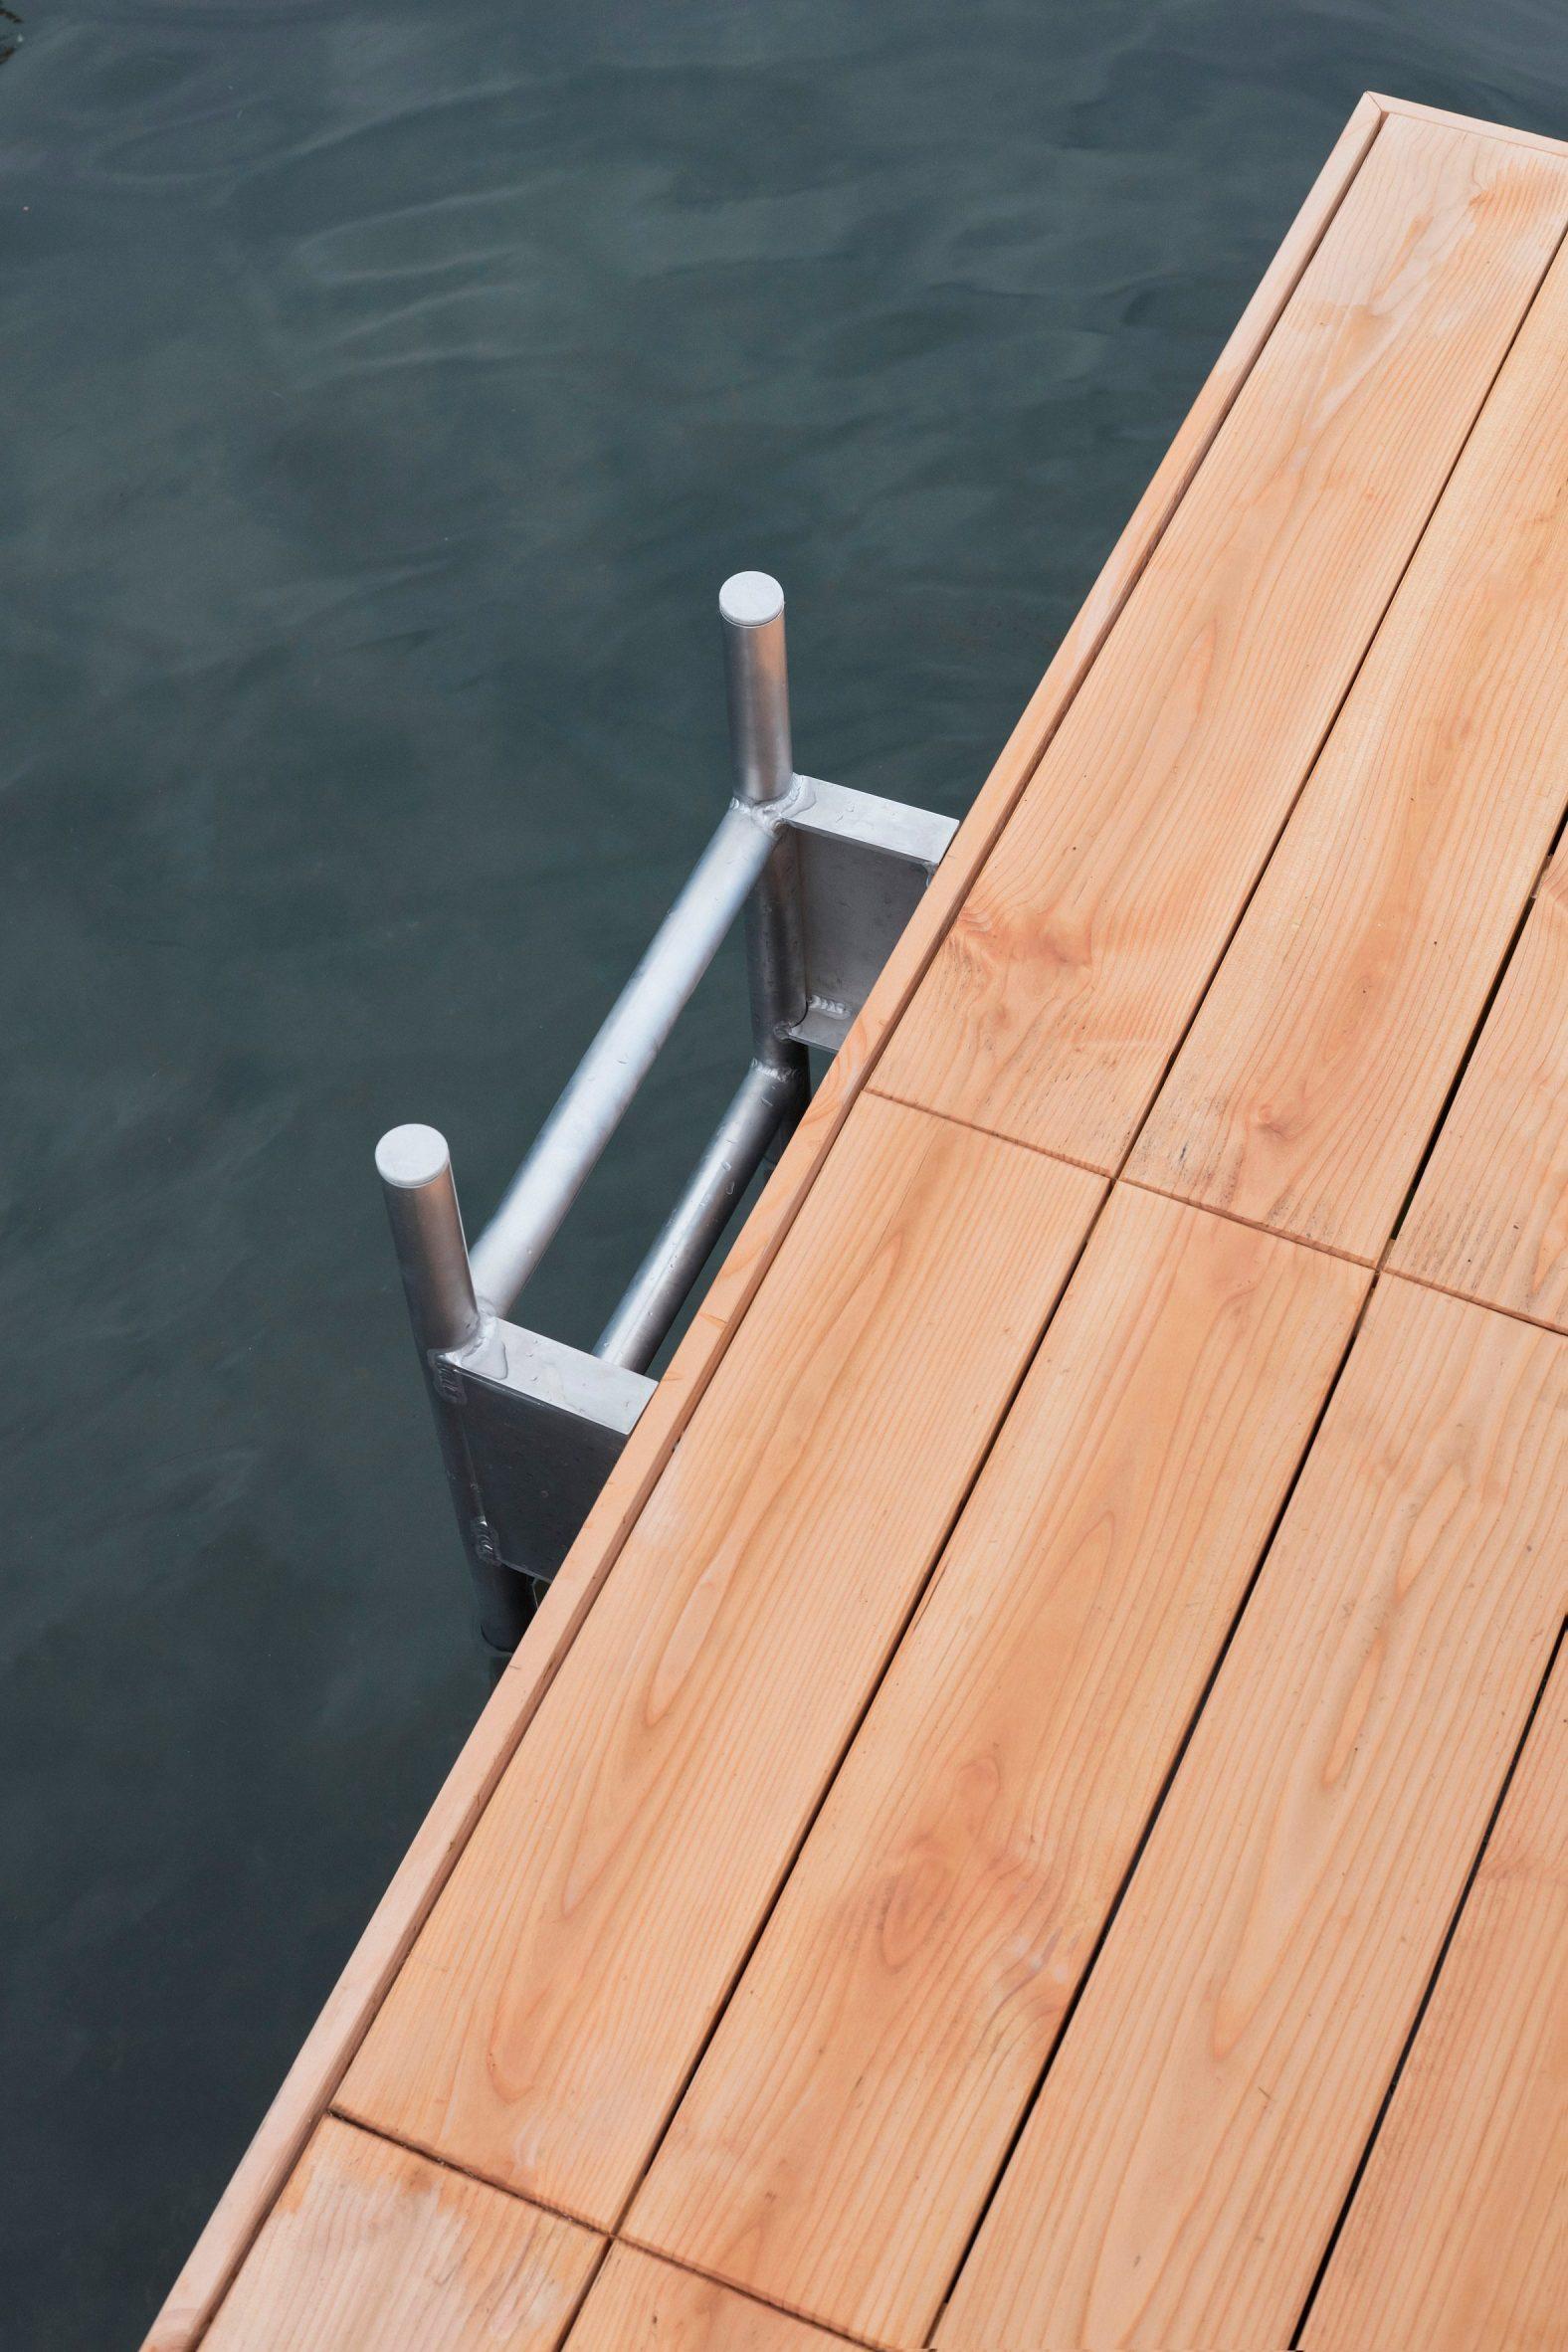 A metal ladder brings people to the deck